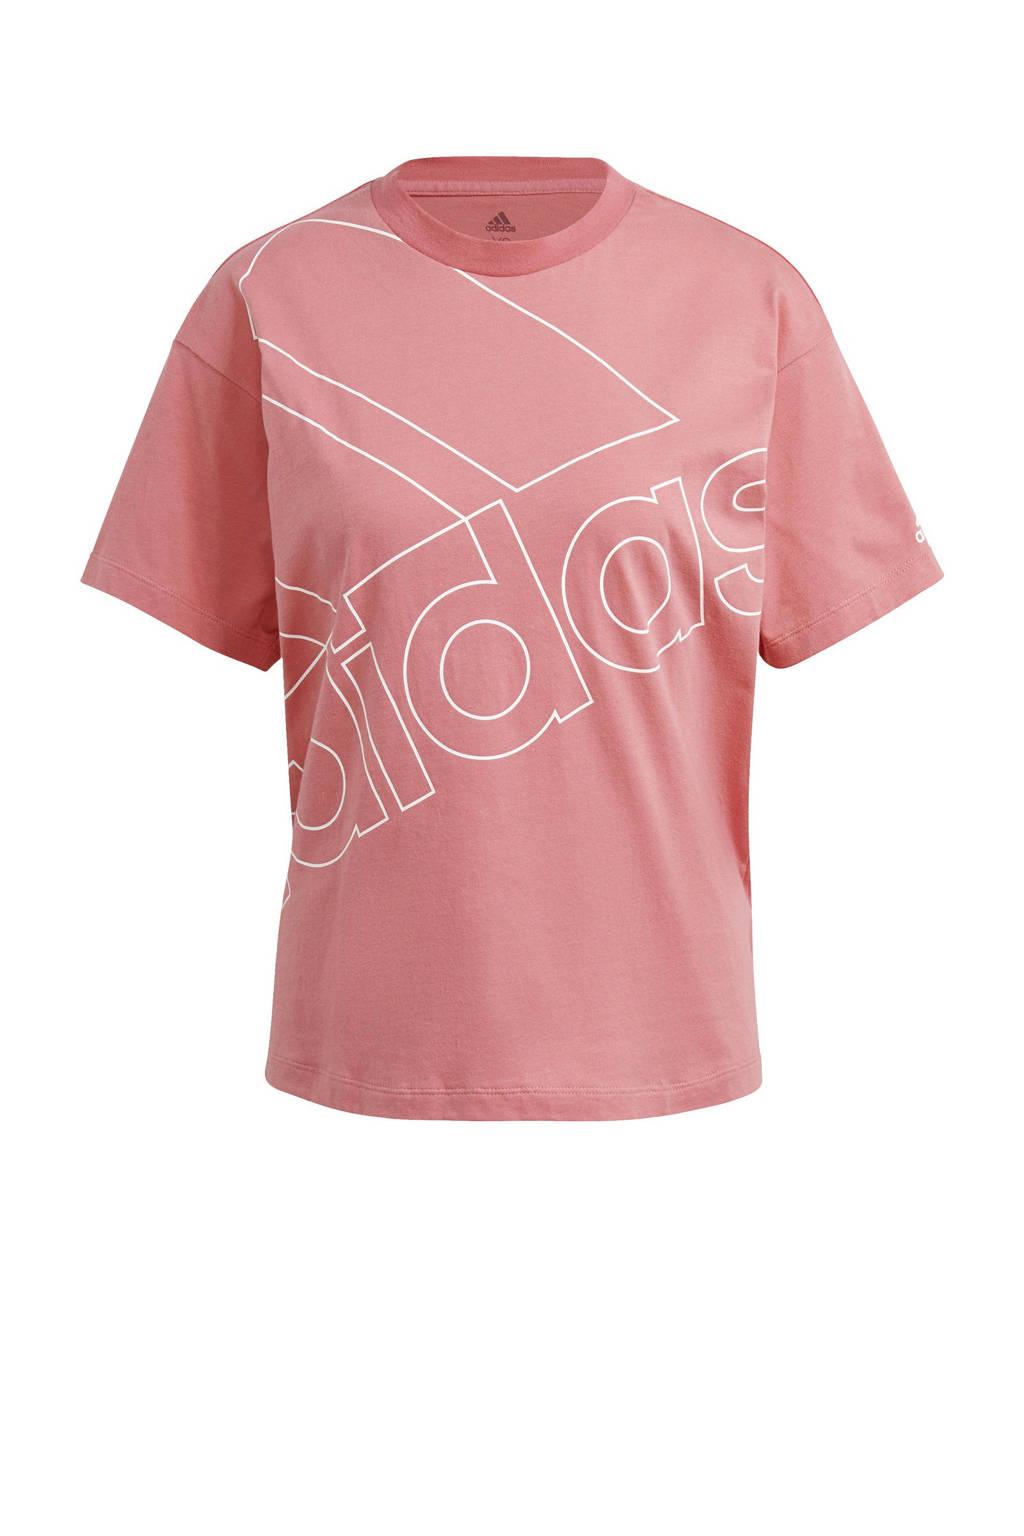 adidas Performance oversized logo sport T-shirt roze/wit, Roze/wit